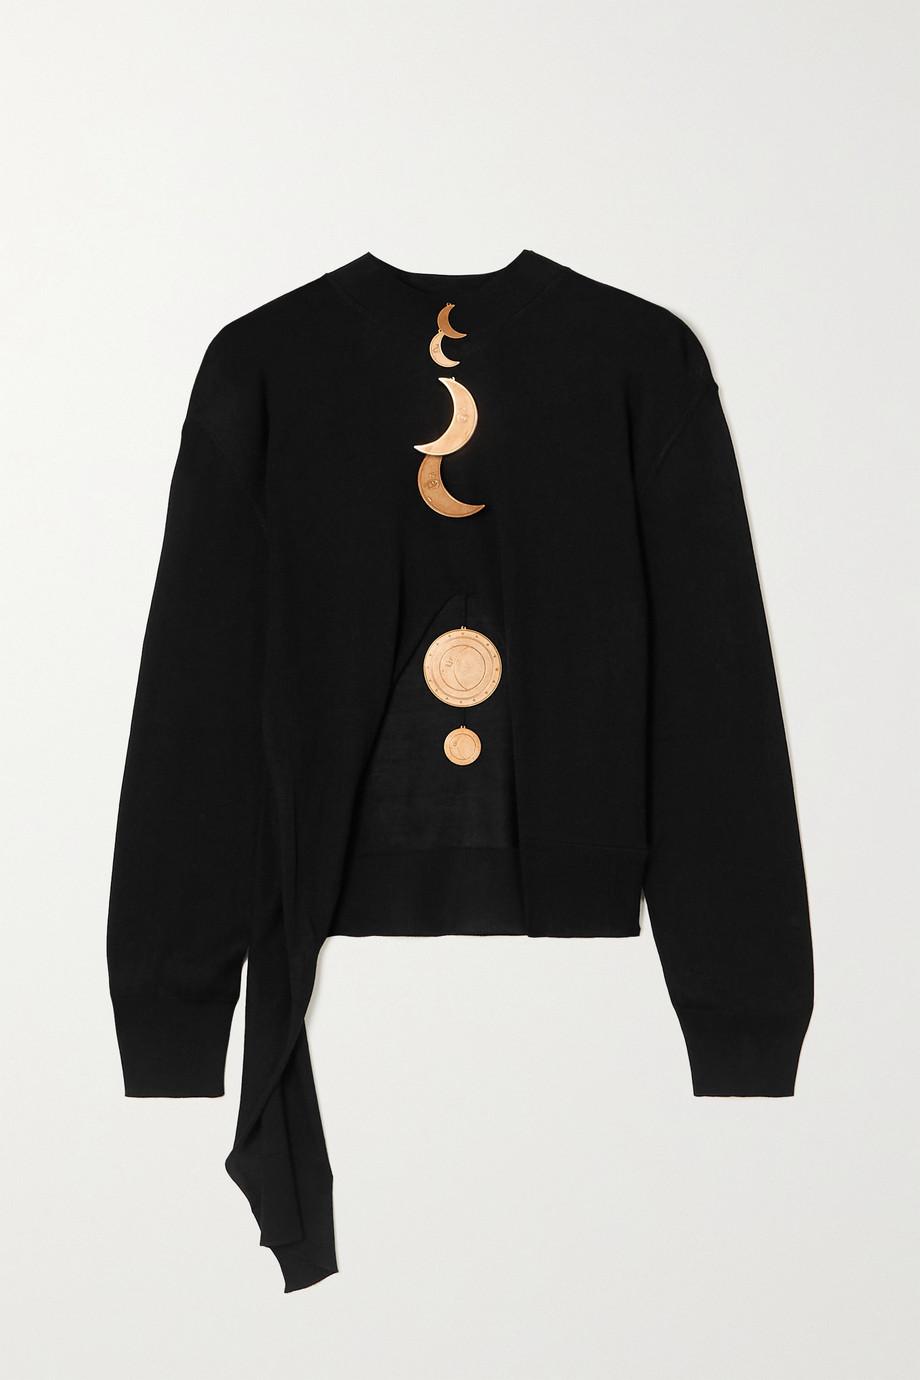 Loewe + Paula's Ibiza asymmetric embellished silk sweater